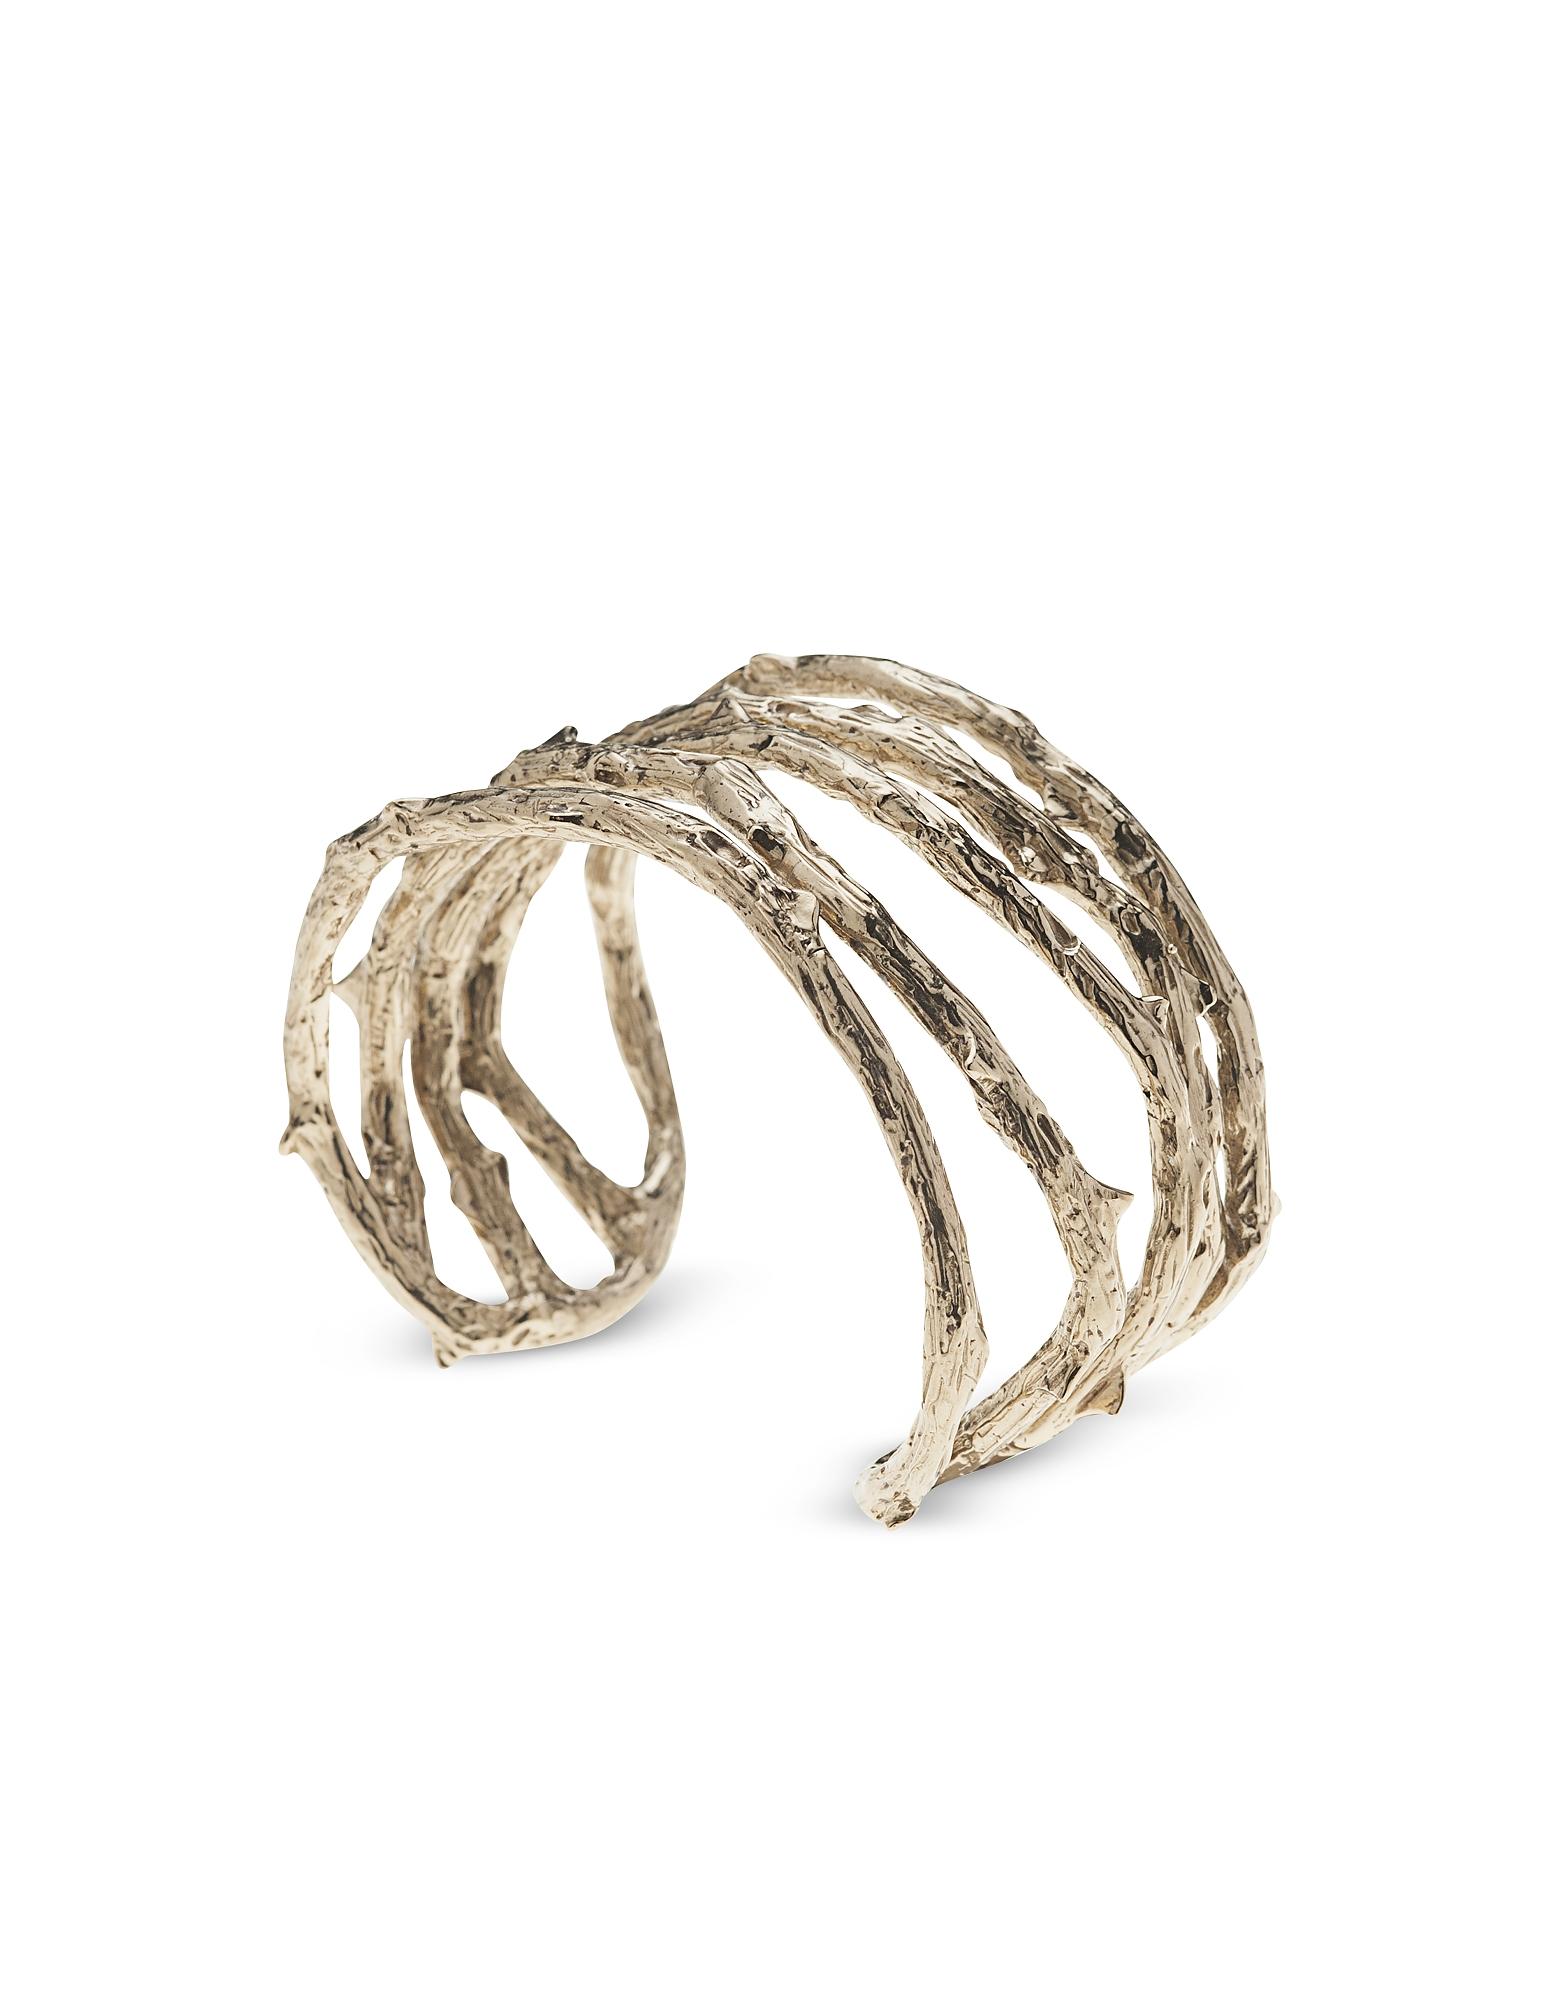 Bronze Thorny Cuff Bracelet